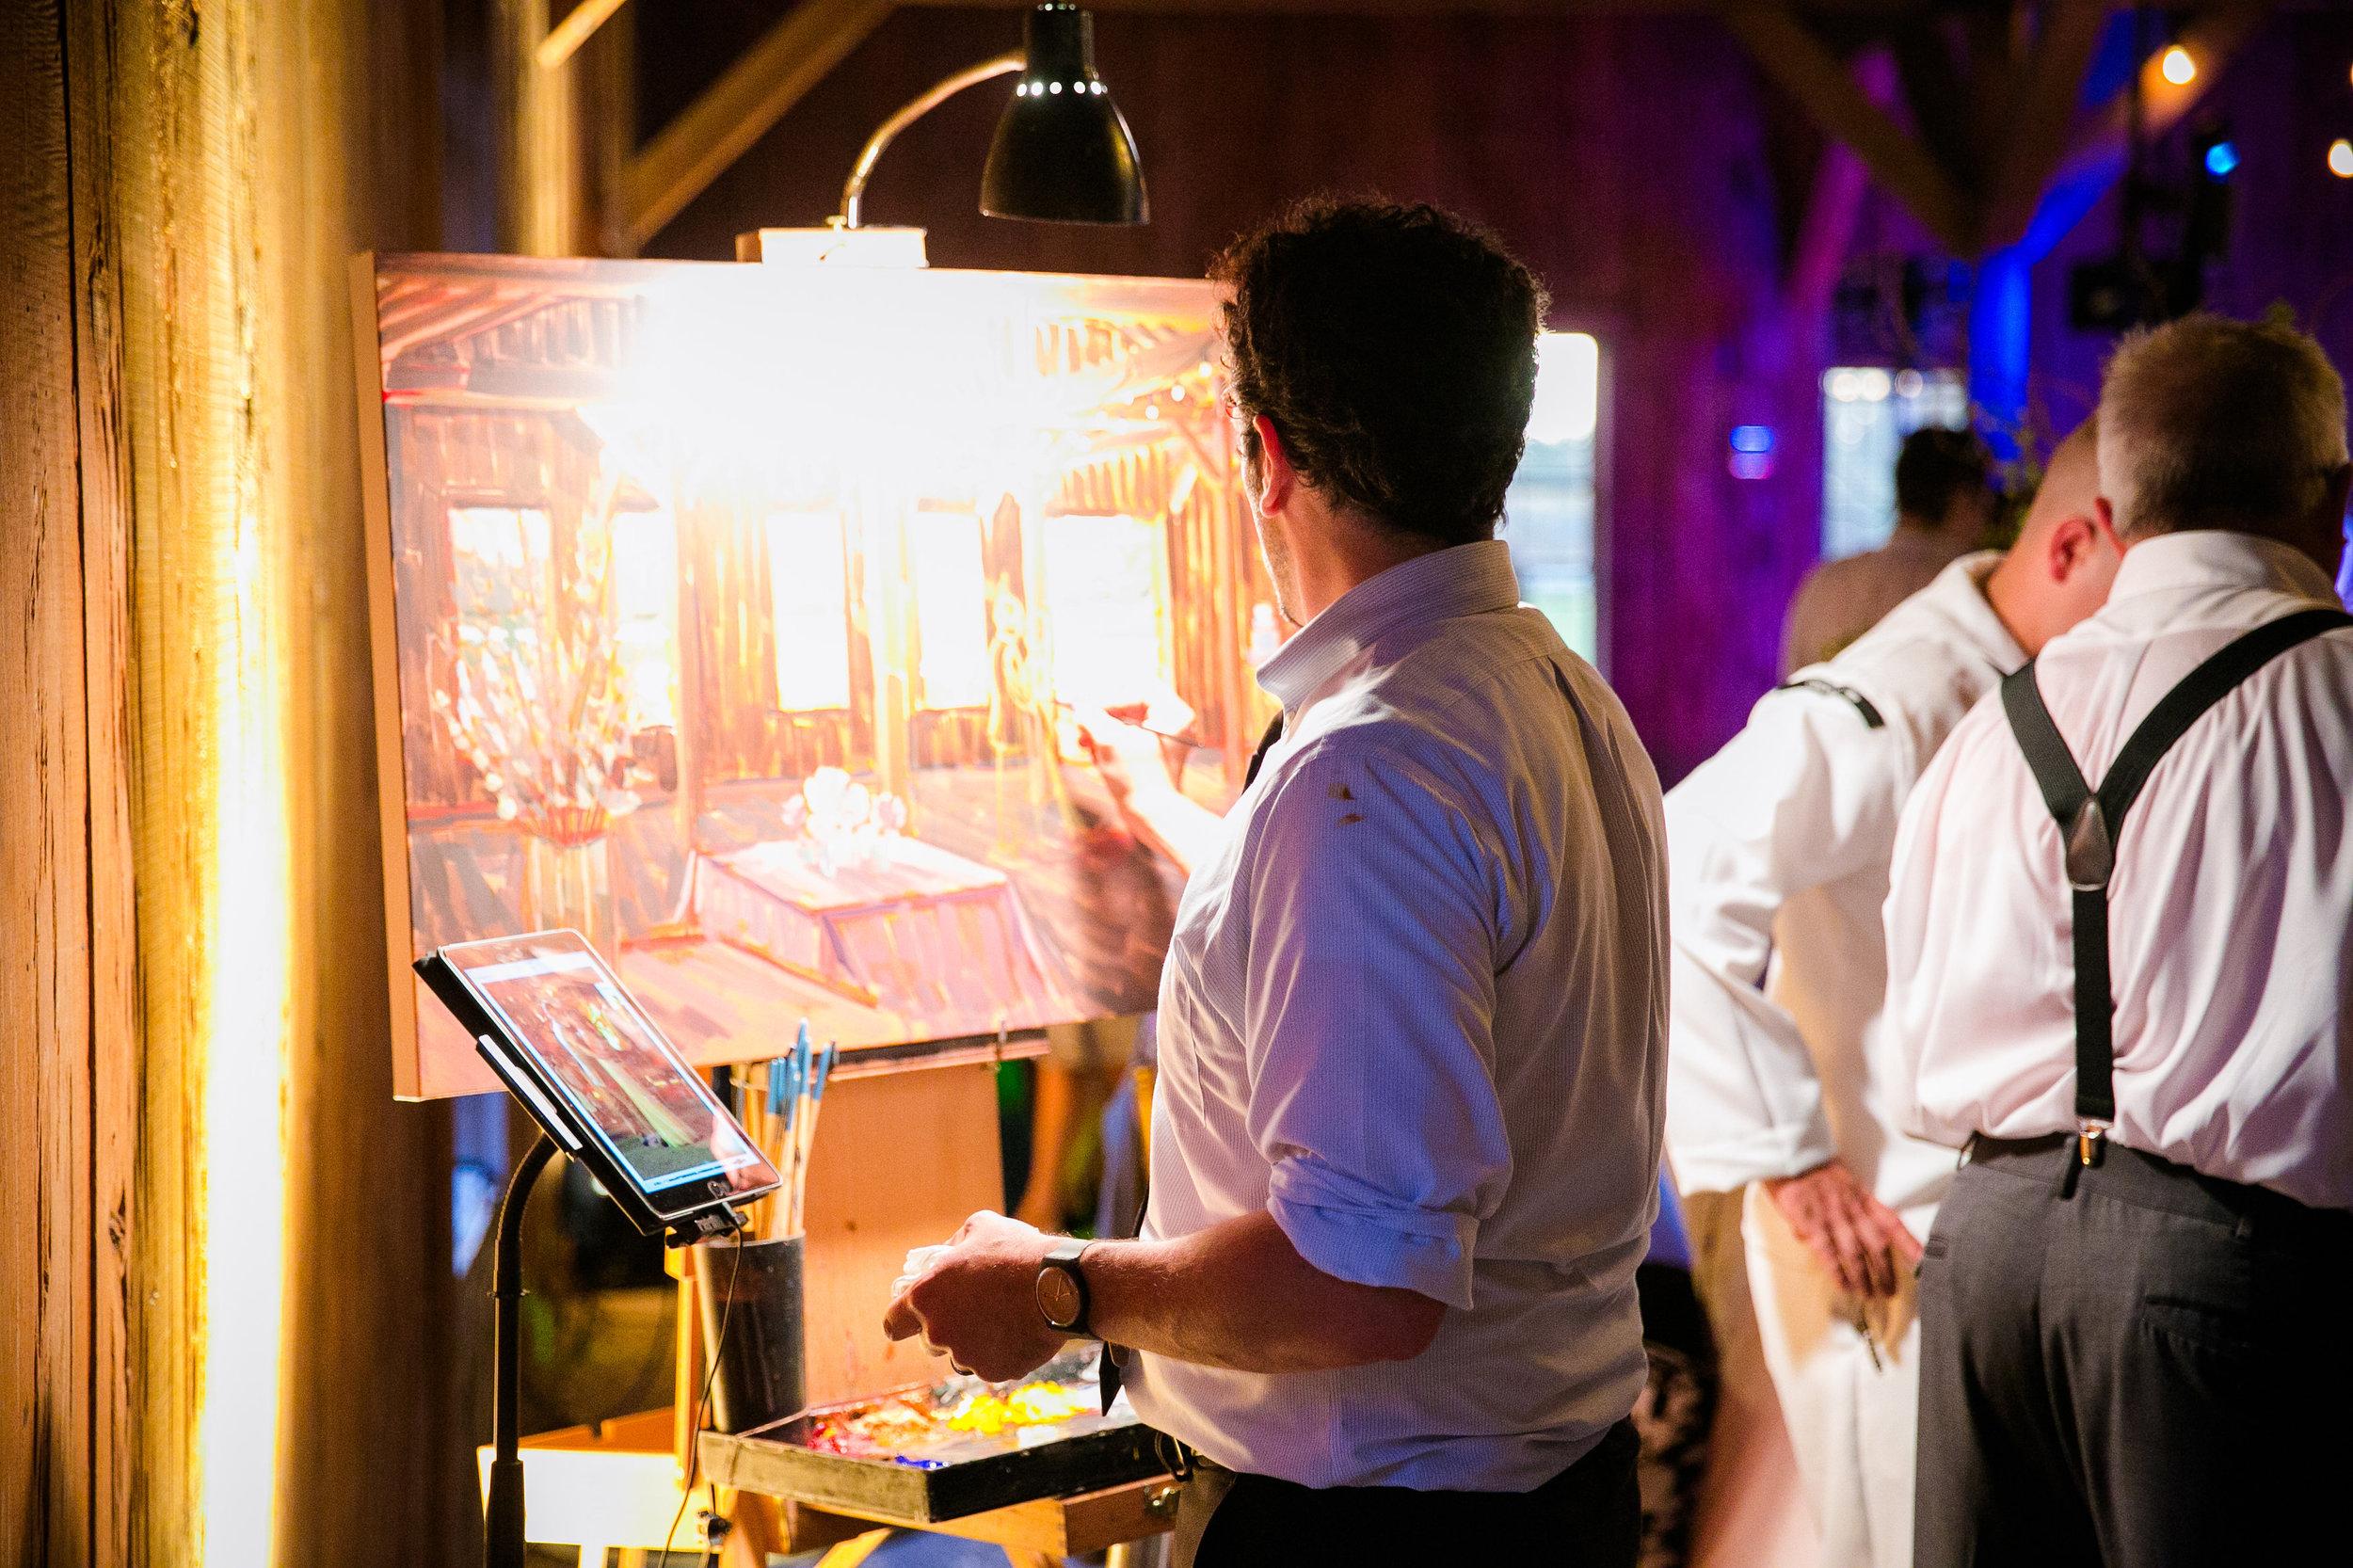 wed-on-canvas-live-wedding-painter-ben-keys